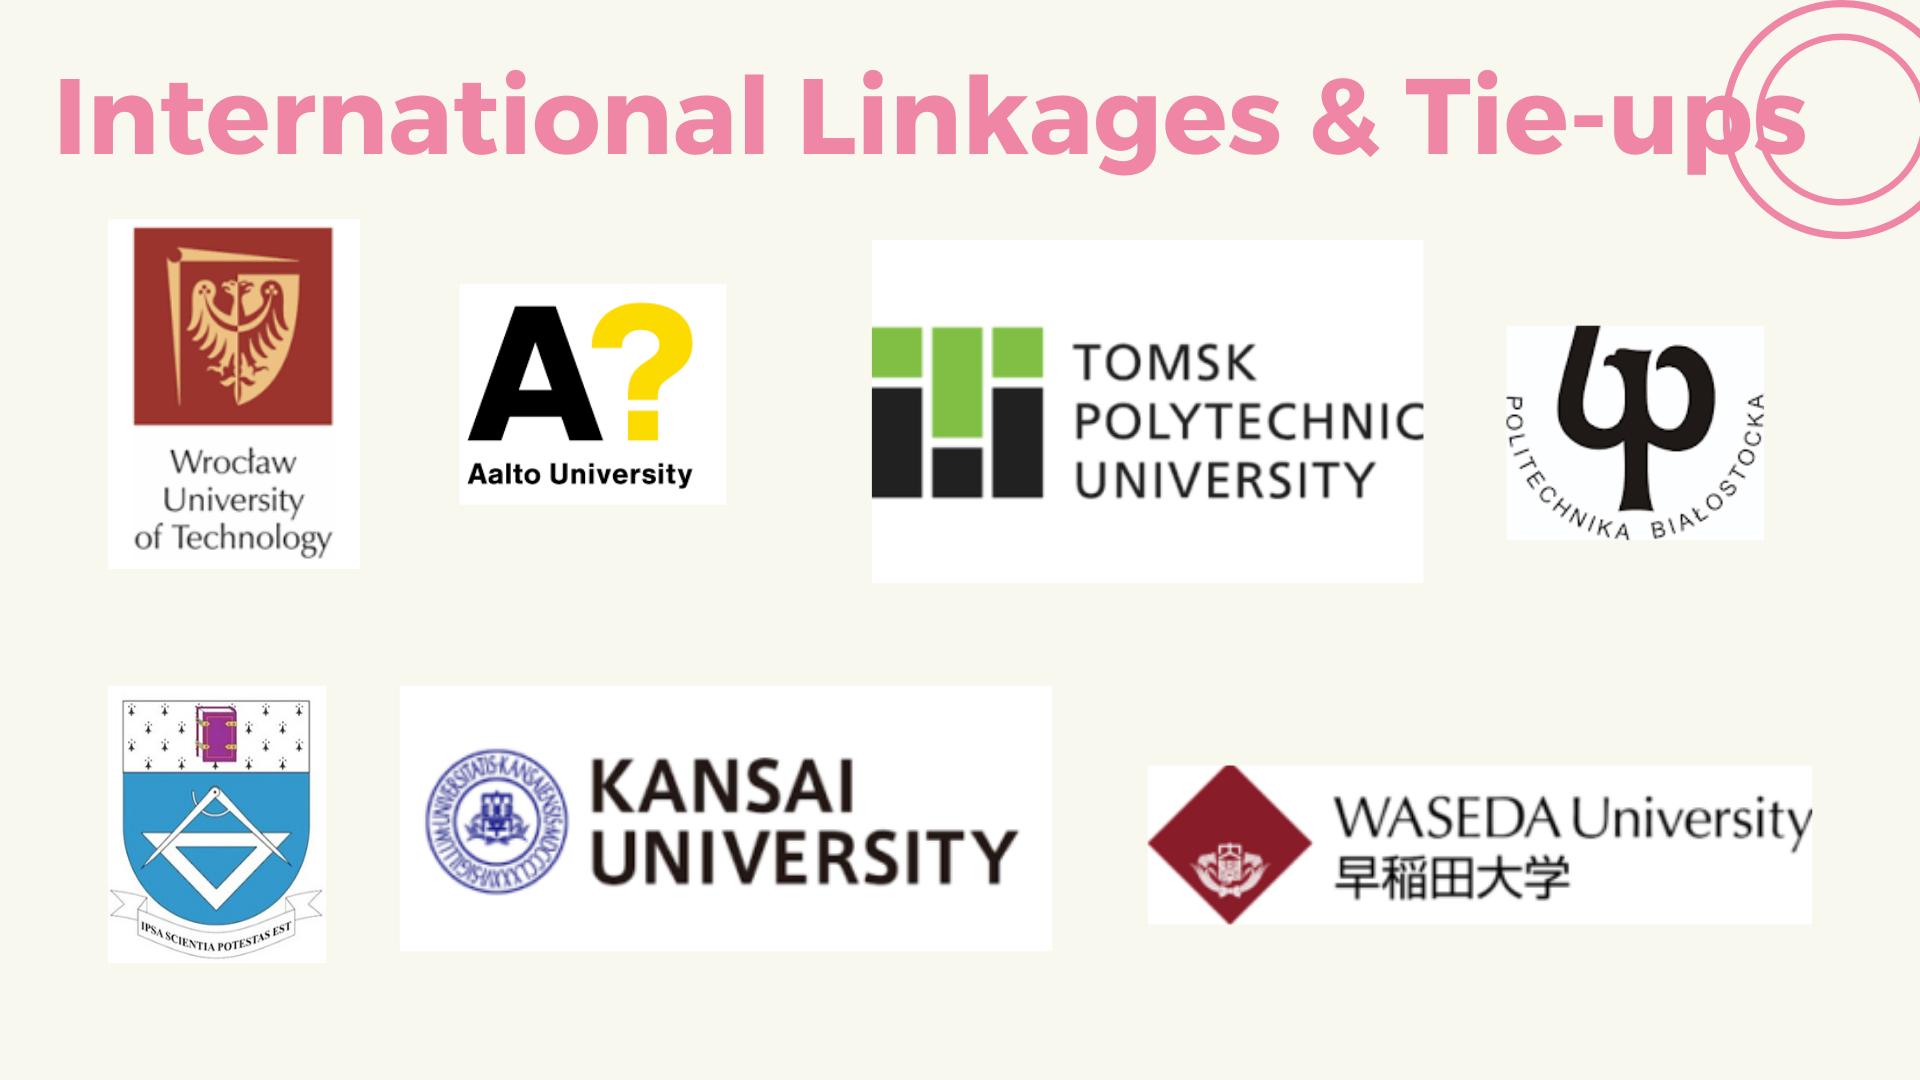 5- International Linkages Tie-Ups